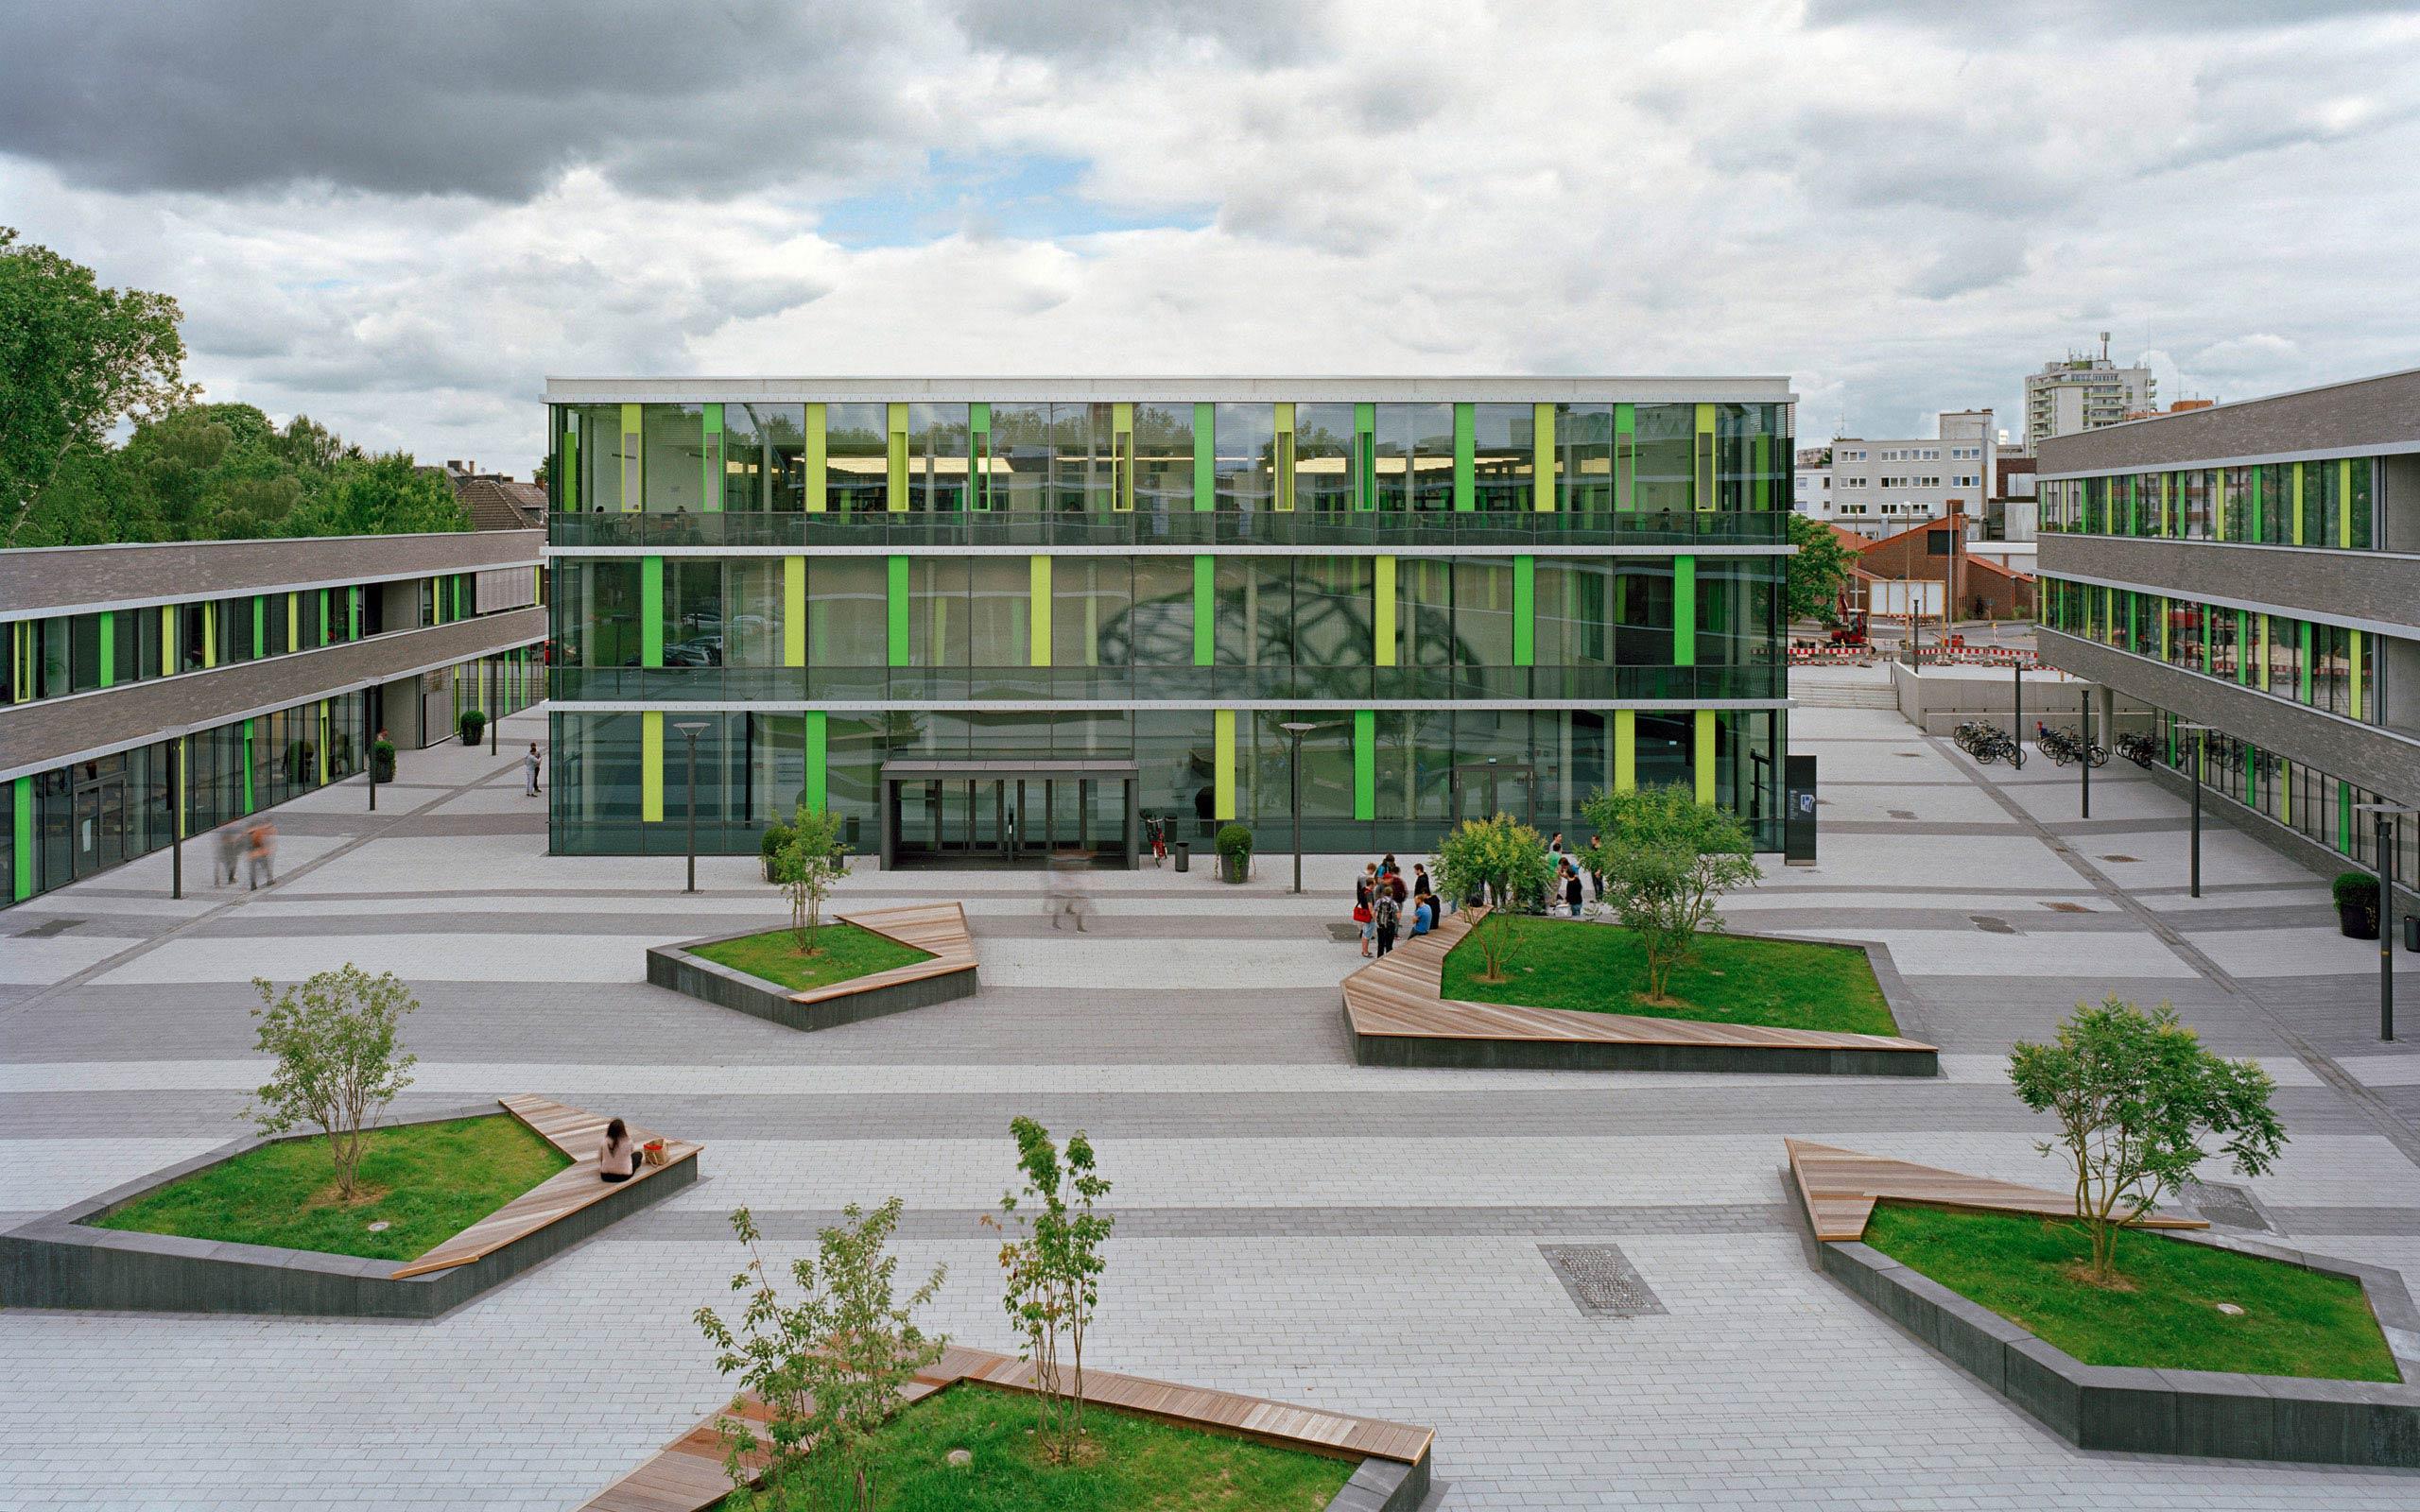 Rhein waal university of applied sciences for Uni architektur